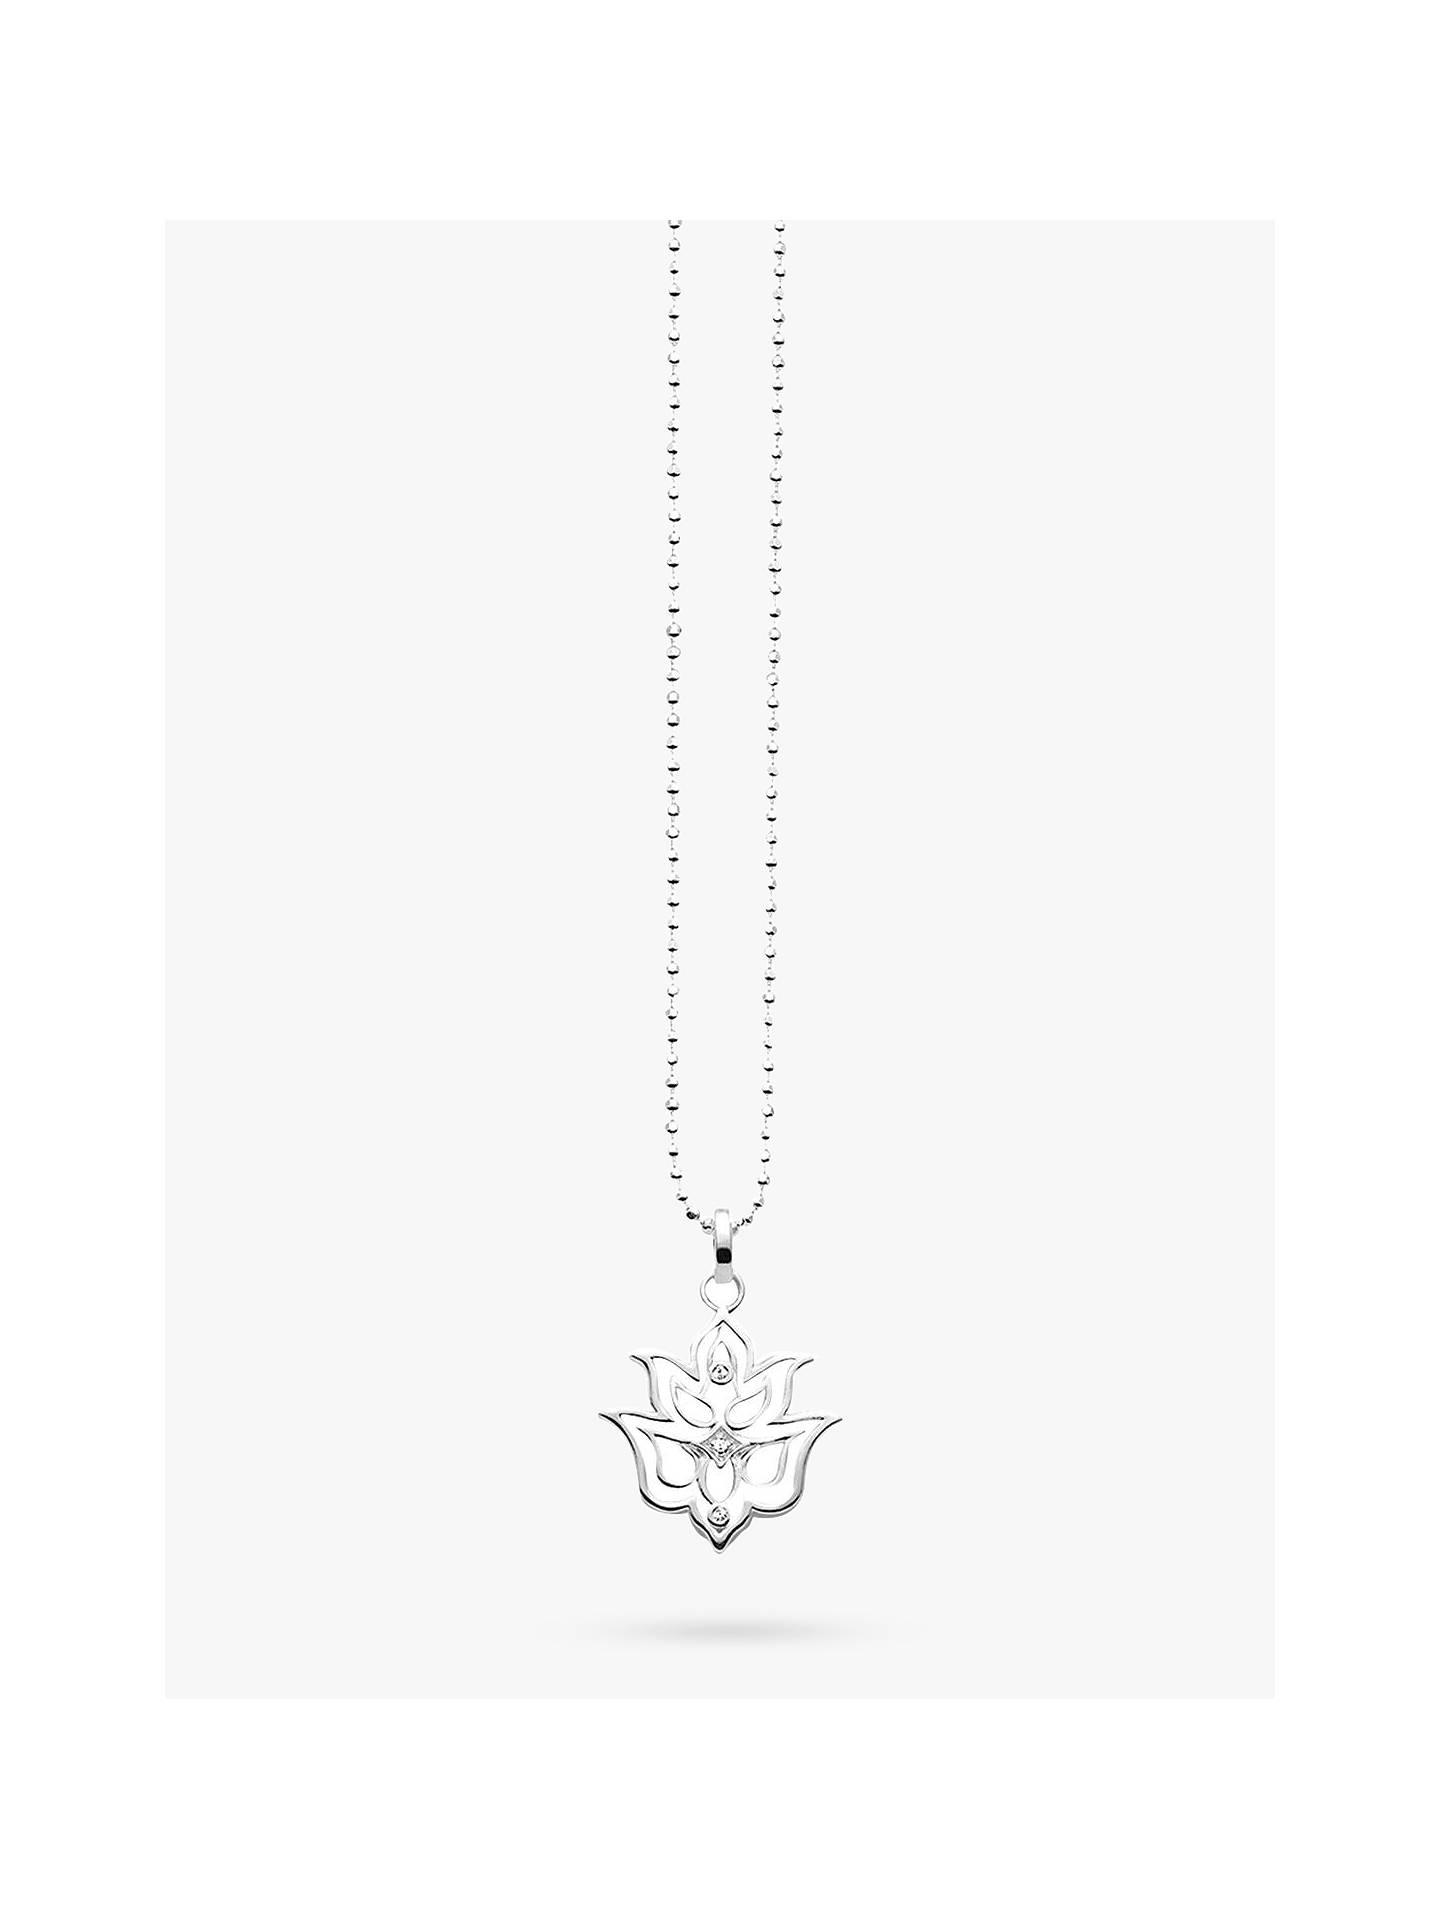 Thomas sabo glam soul lotus flower pendant necklace silver at buythomas sabo glam soul lotus flower pendant necklace silver online at johnlewis izmirmasajfo